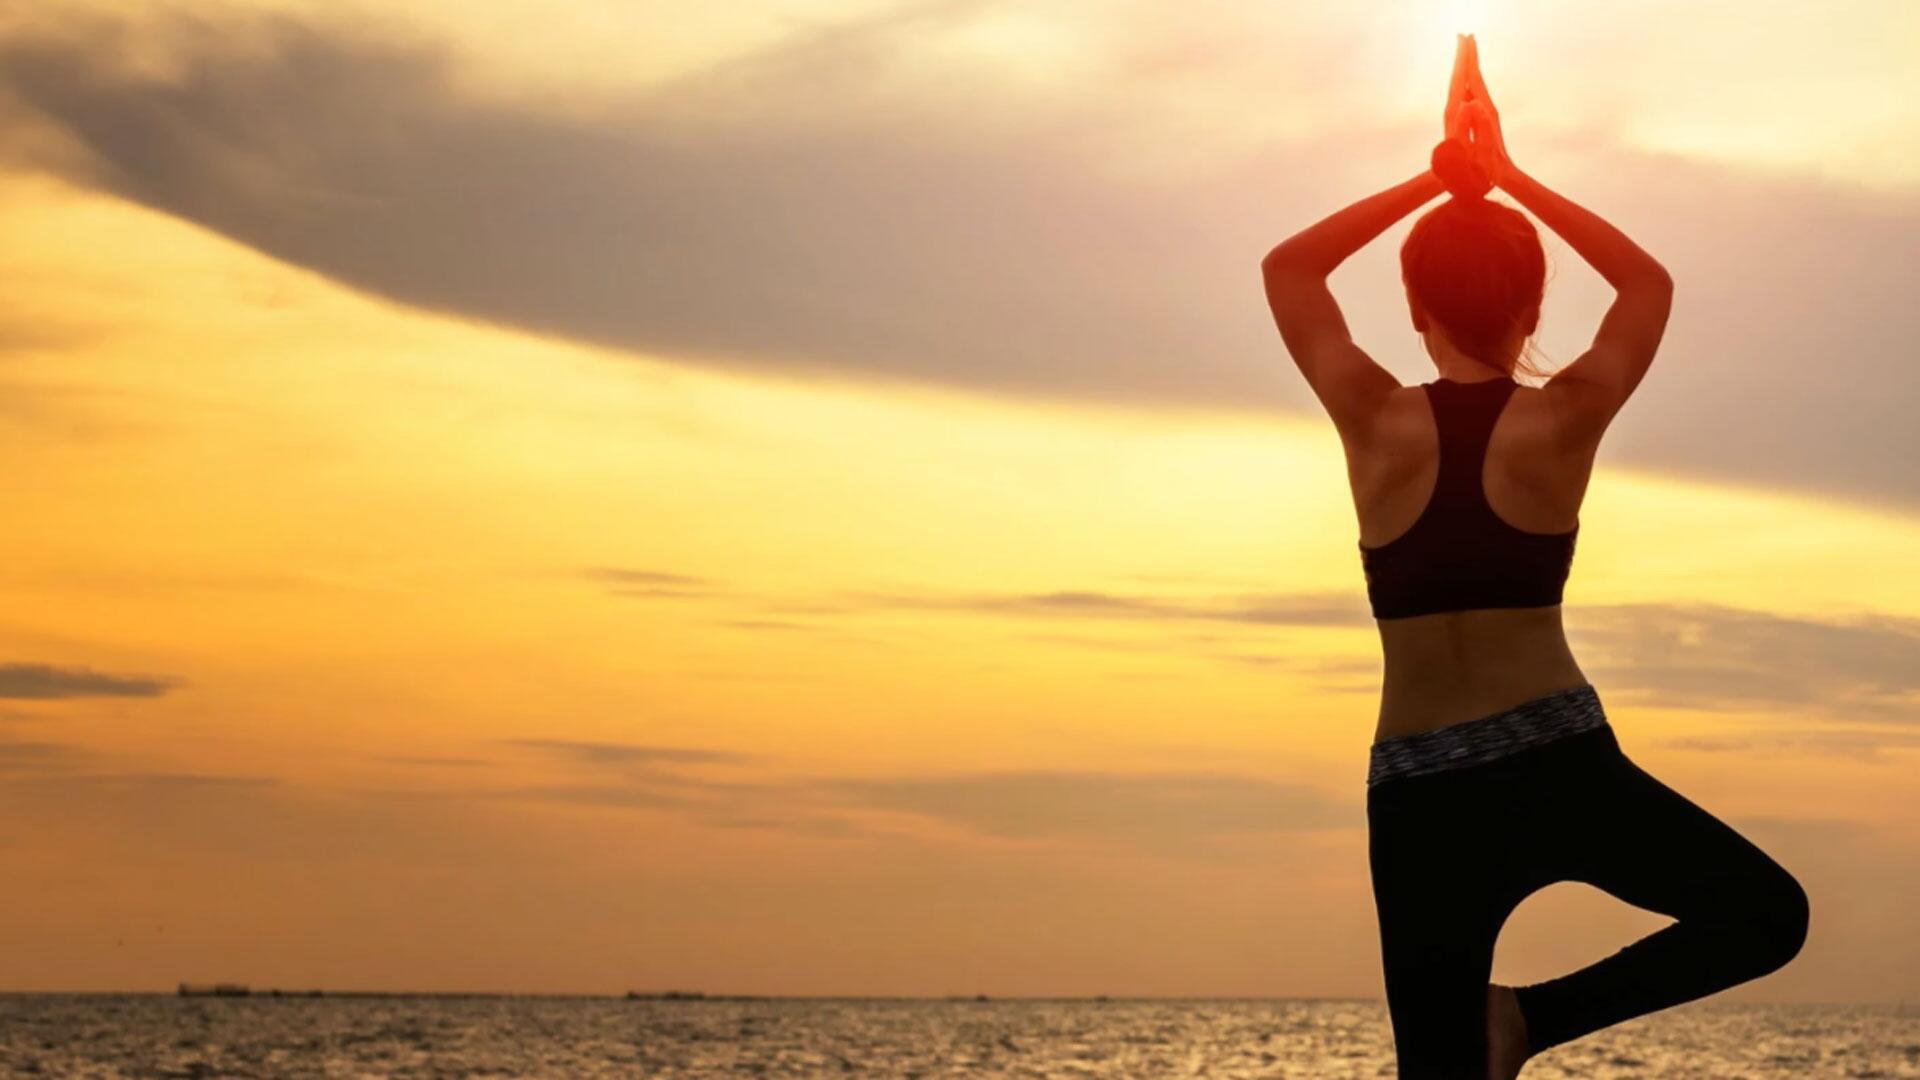 Bild zu Yoga, Übung, Sonne